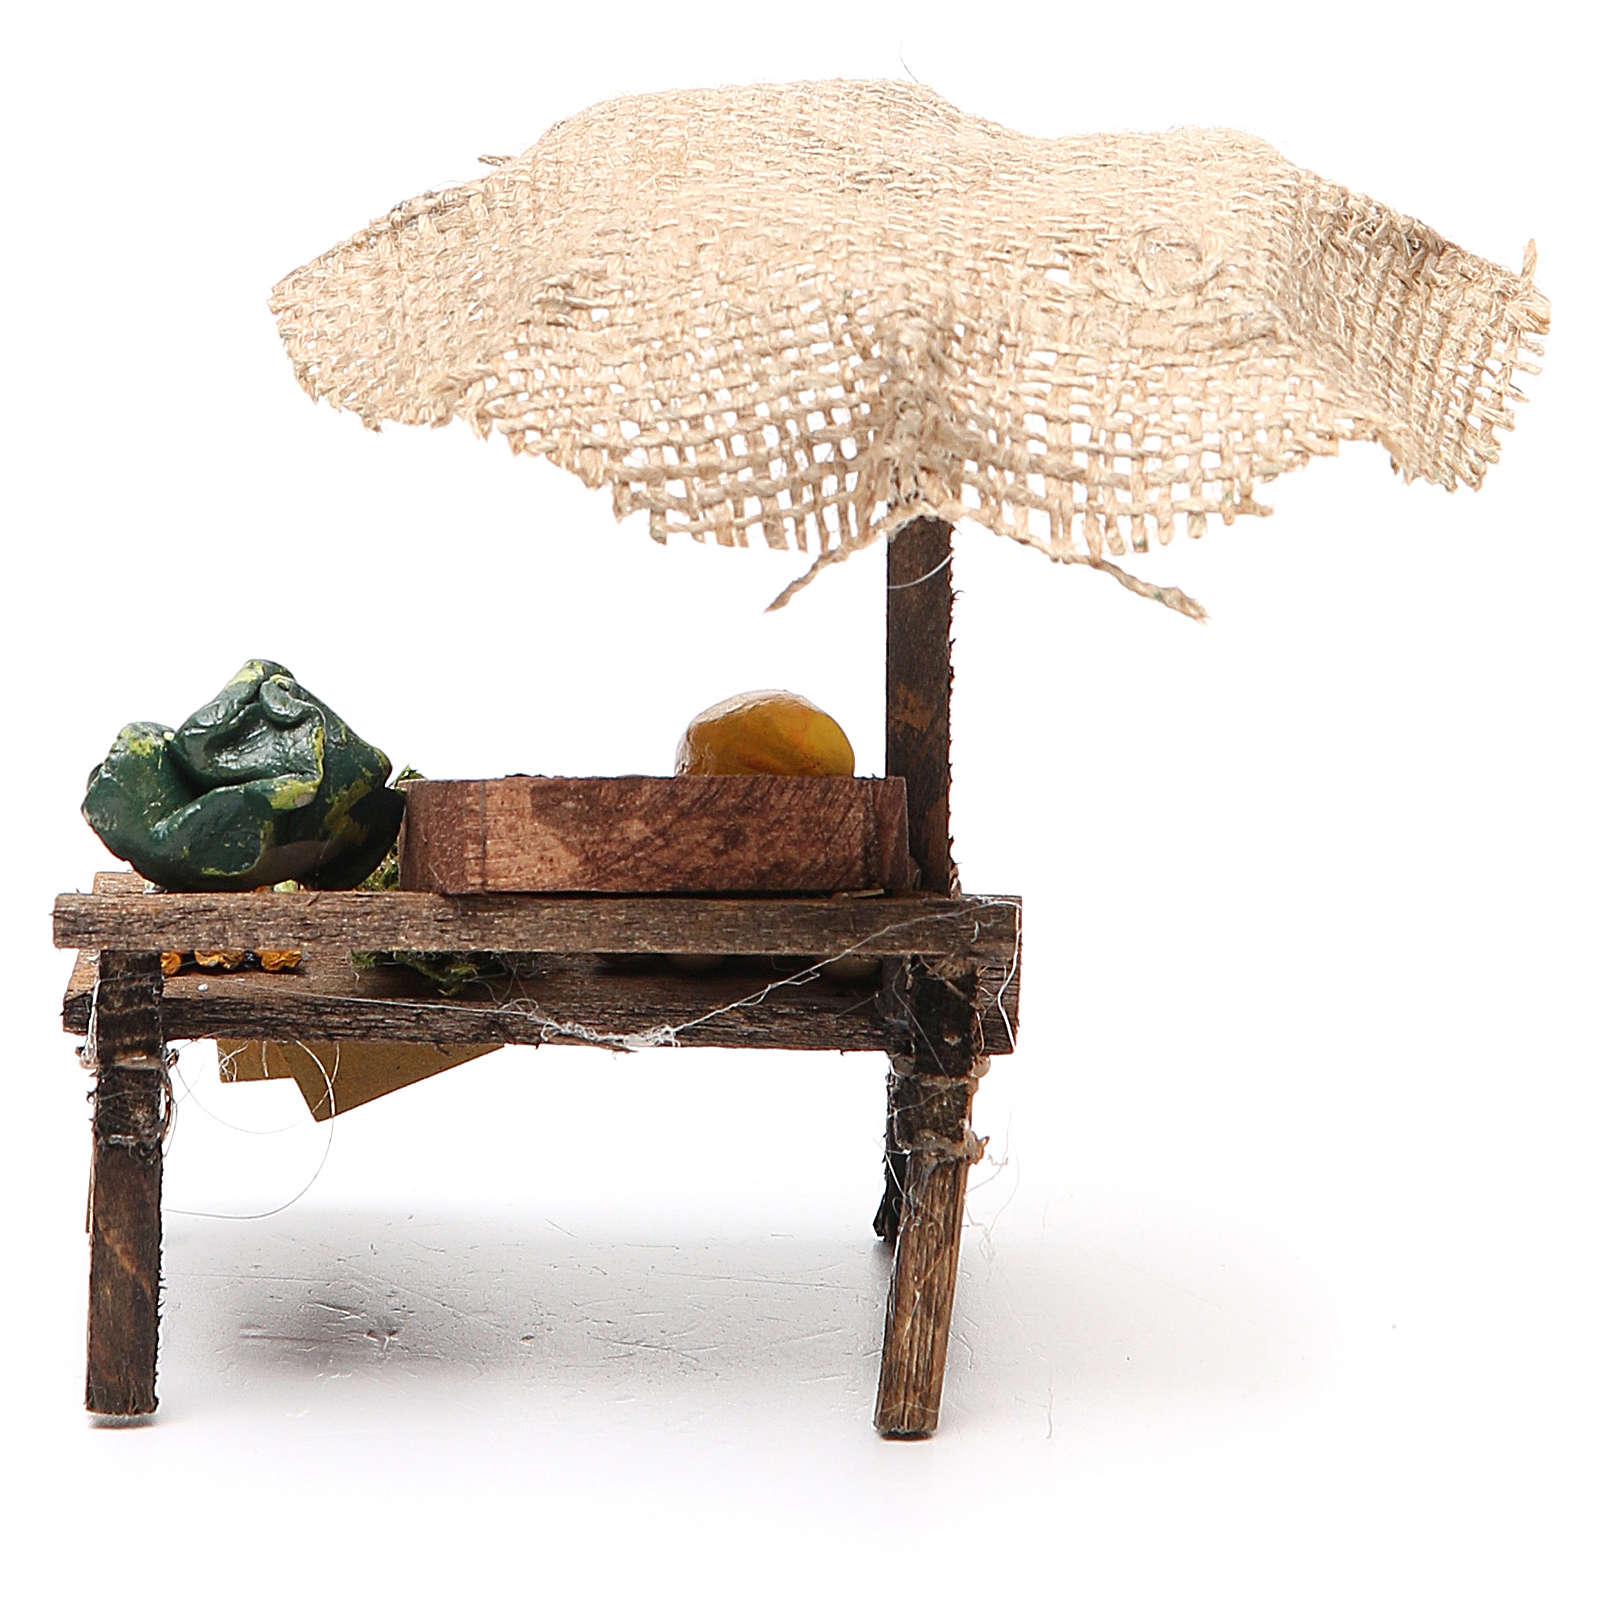 Banco presepe con ombrello verdure 12x10x12 cm 4